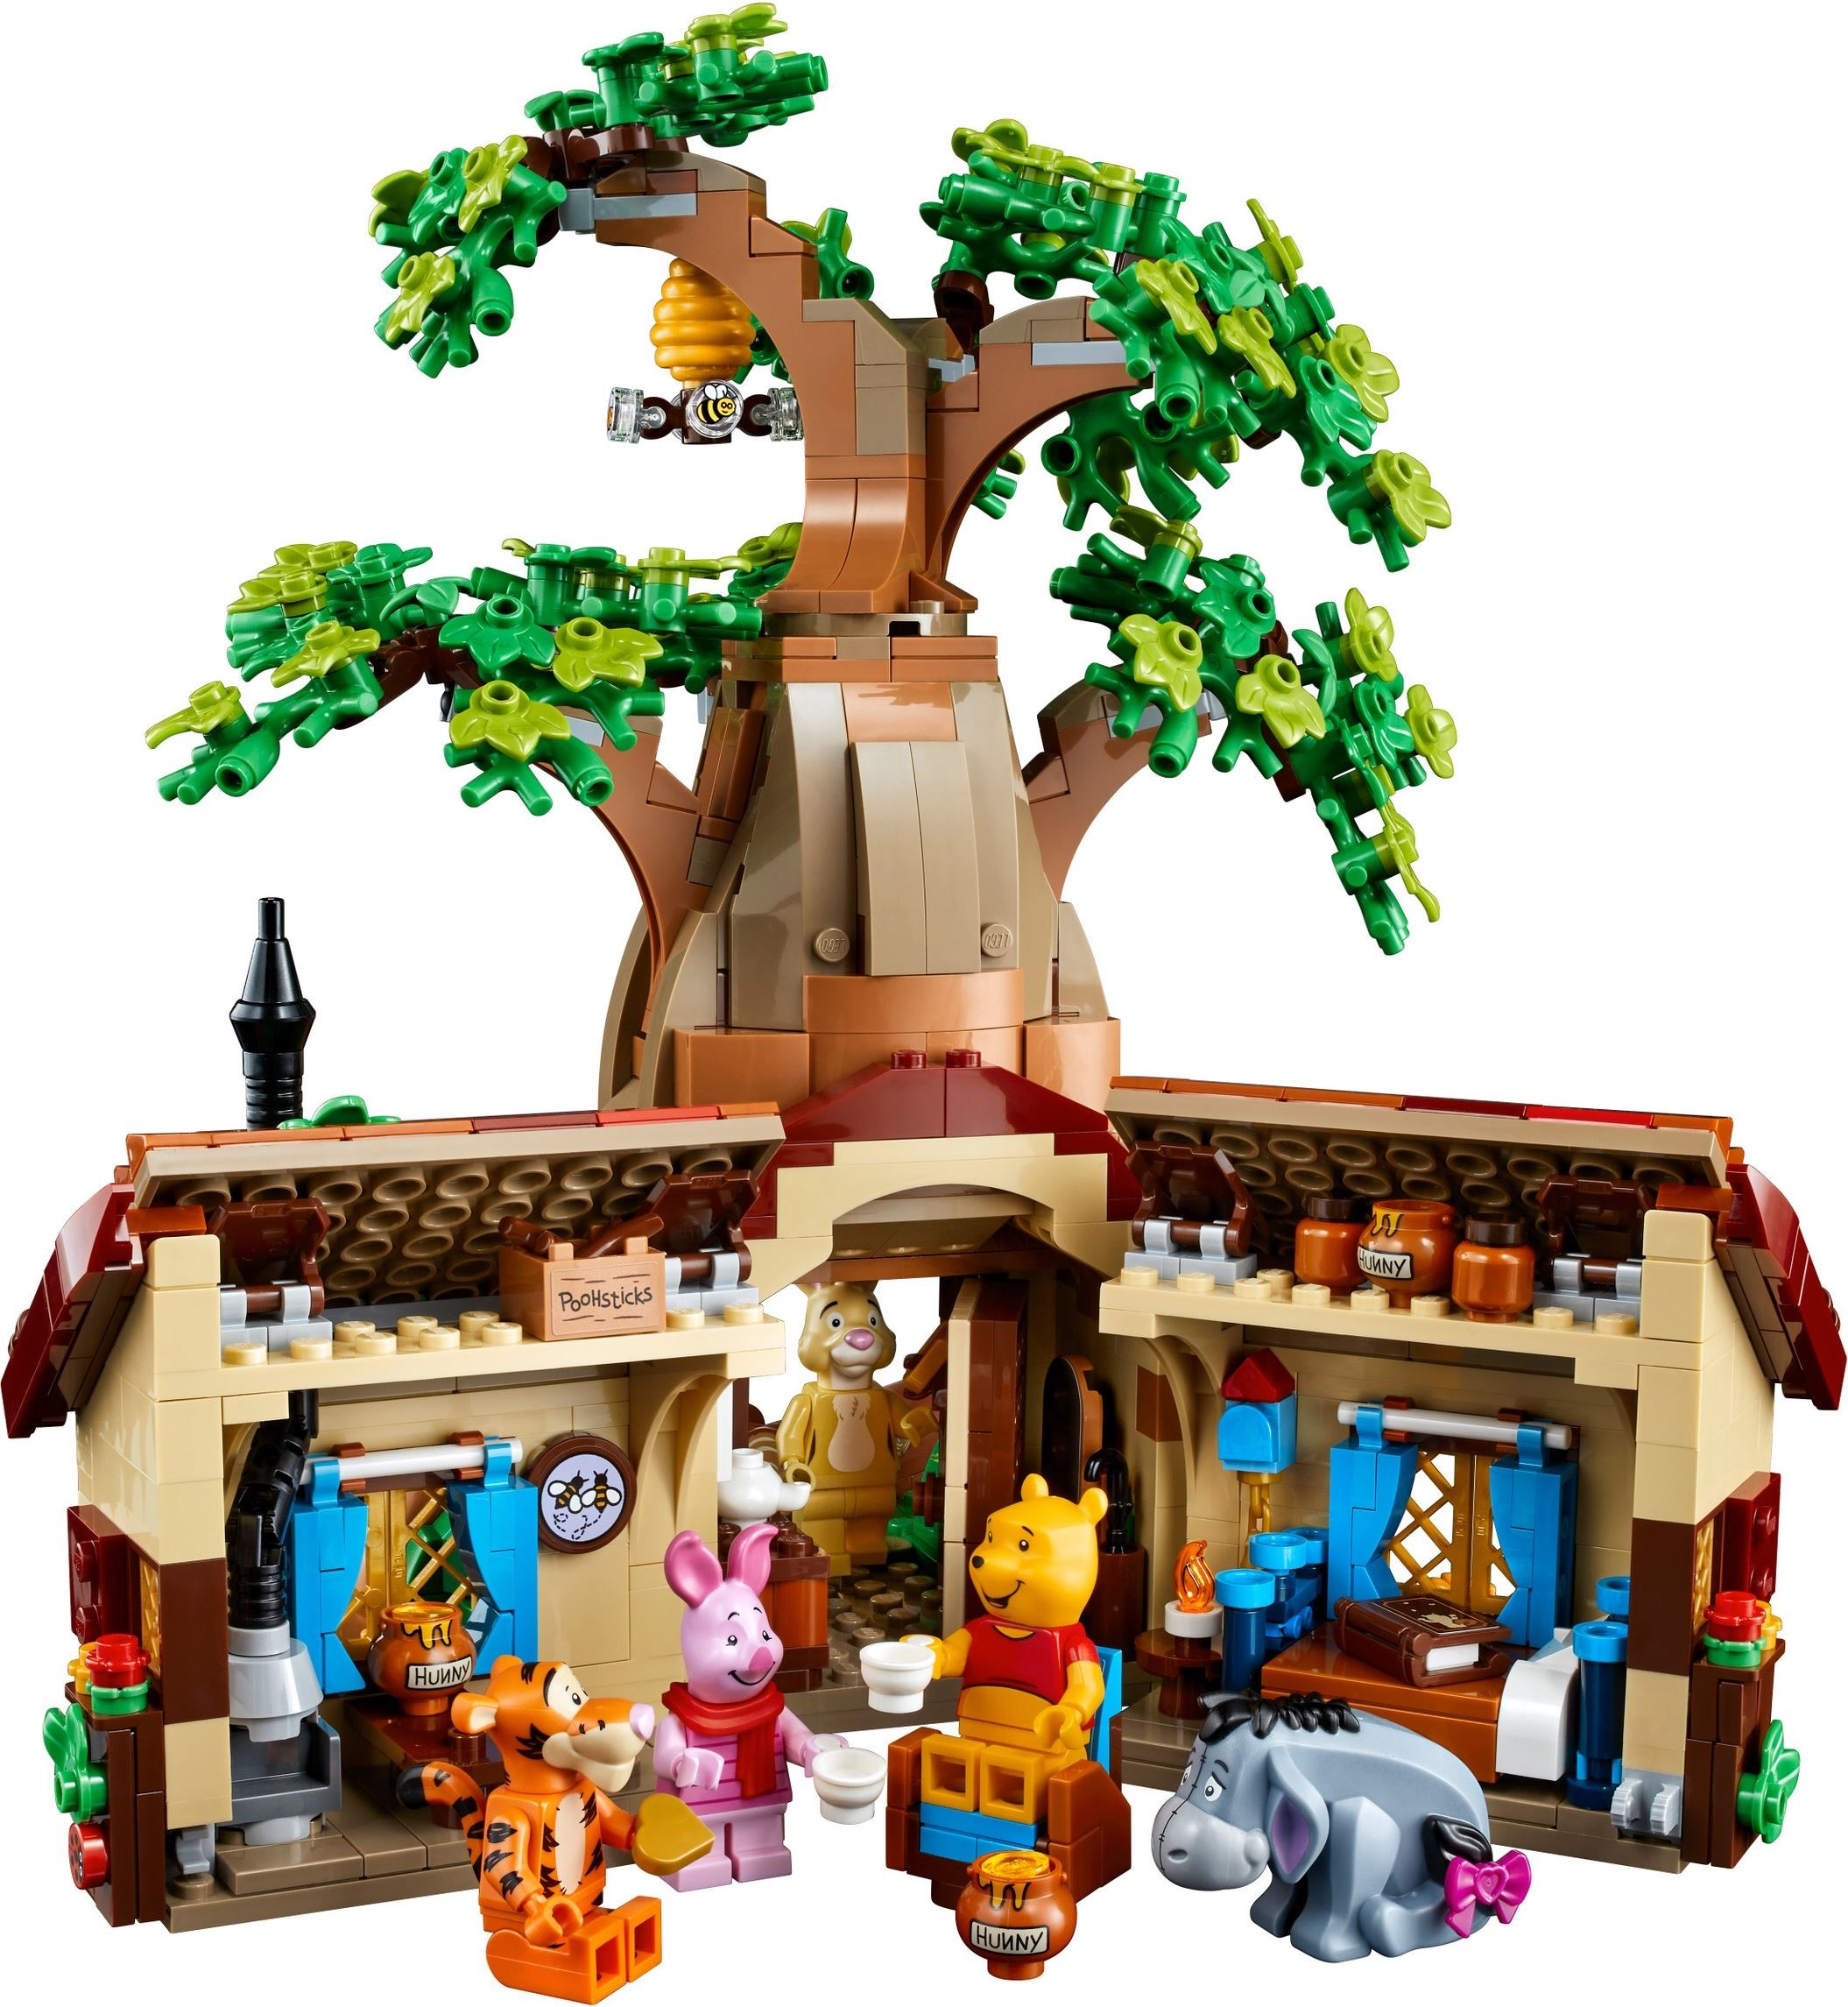 21326 LEGO Ideas Winnie the Pooh - Đồ chơi xếp hình LEGO